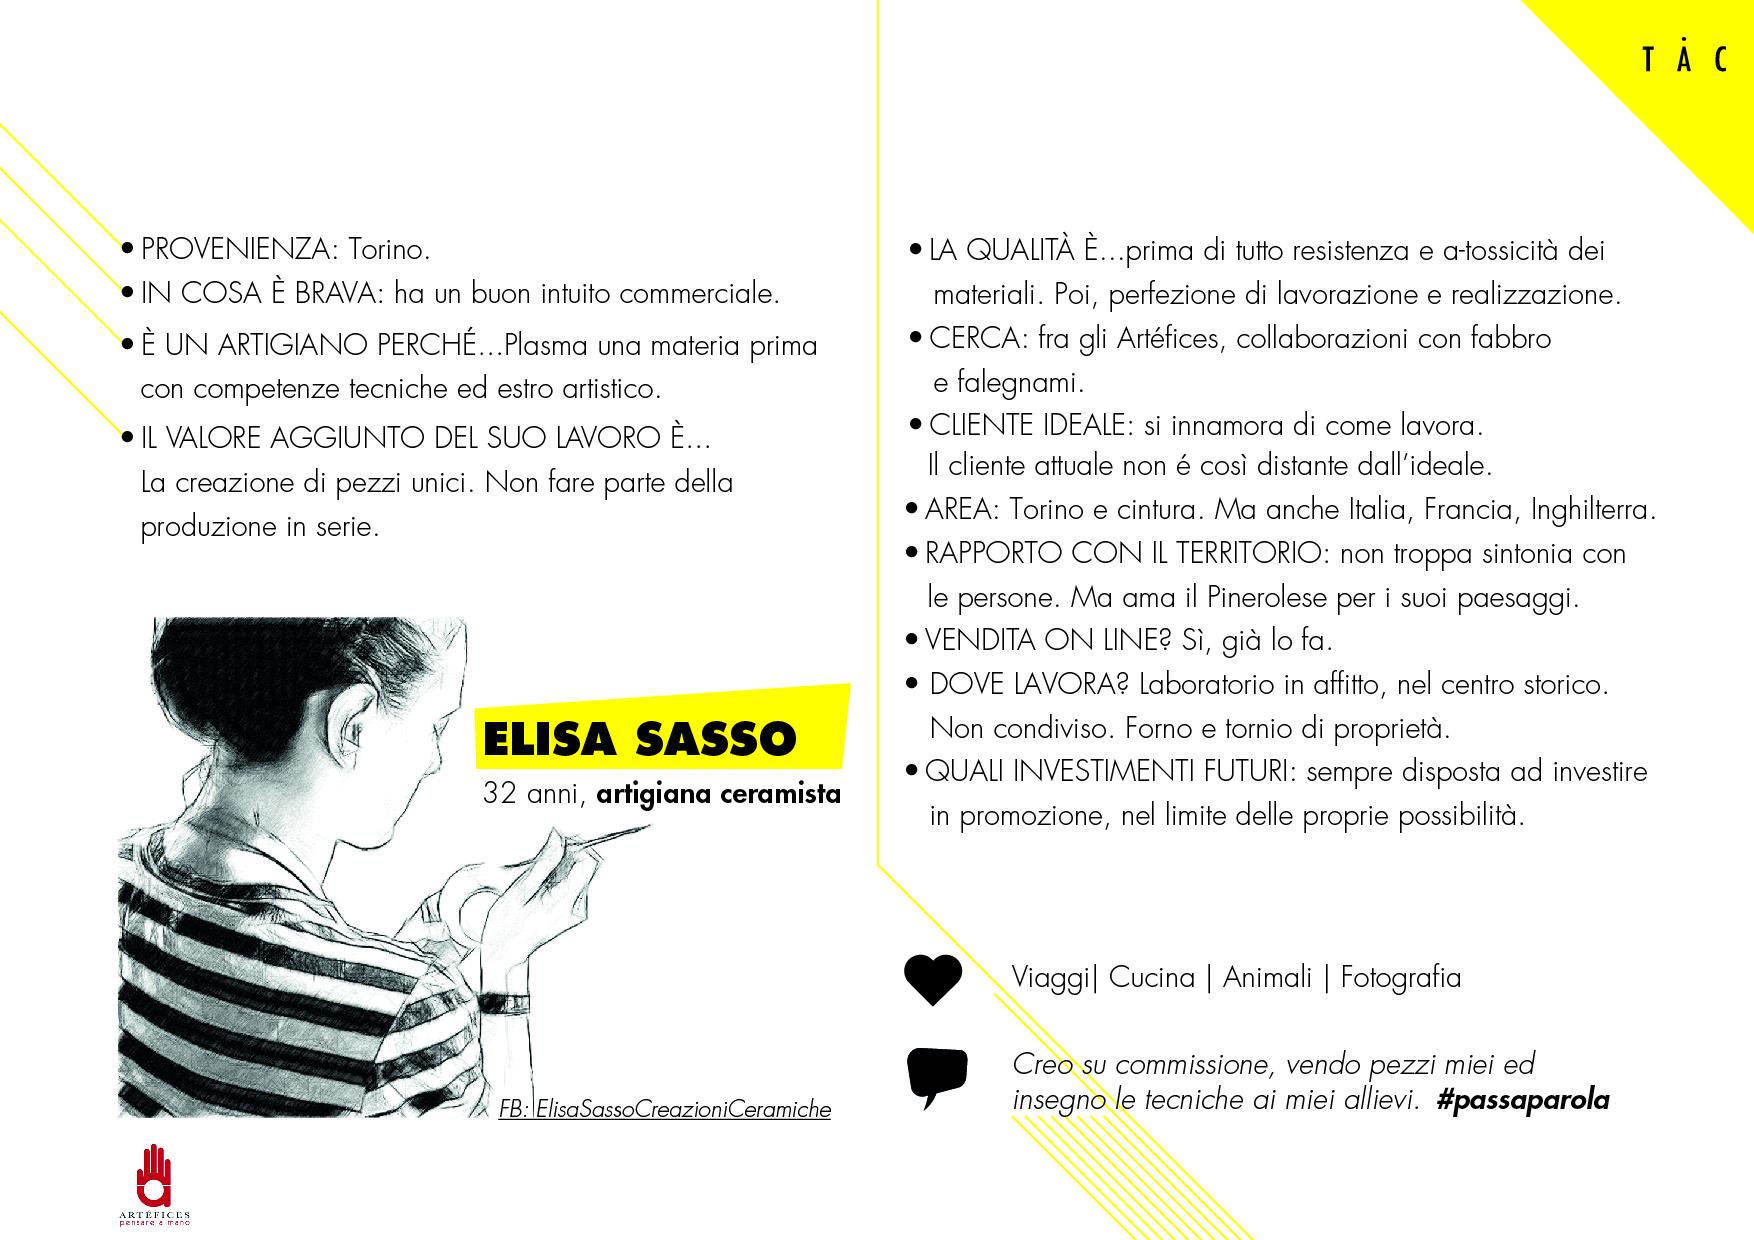 ELISA SASSO